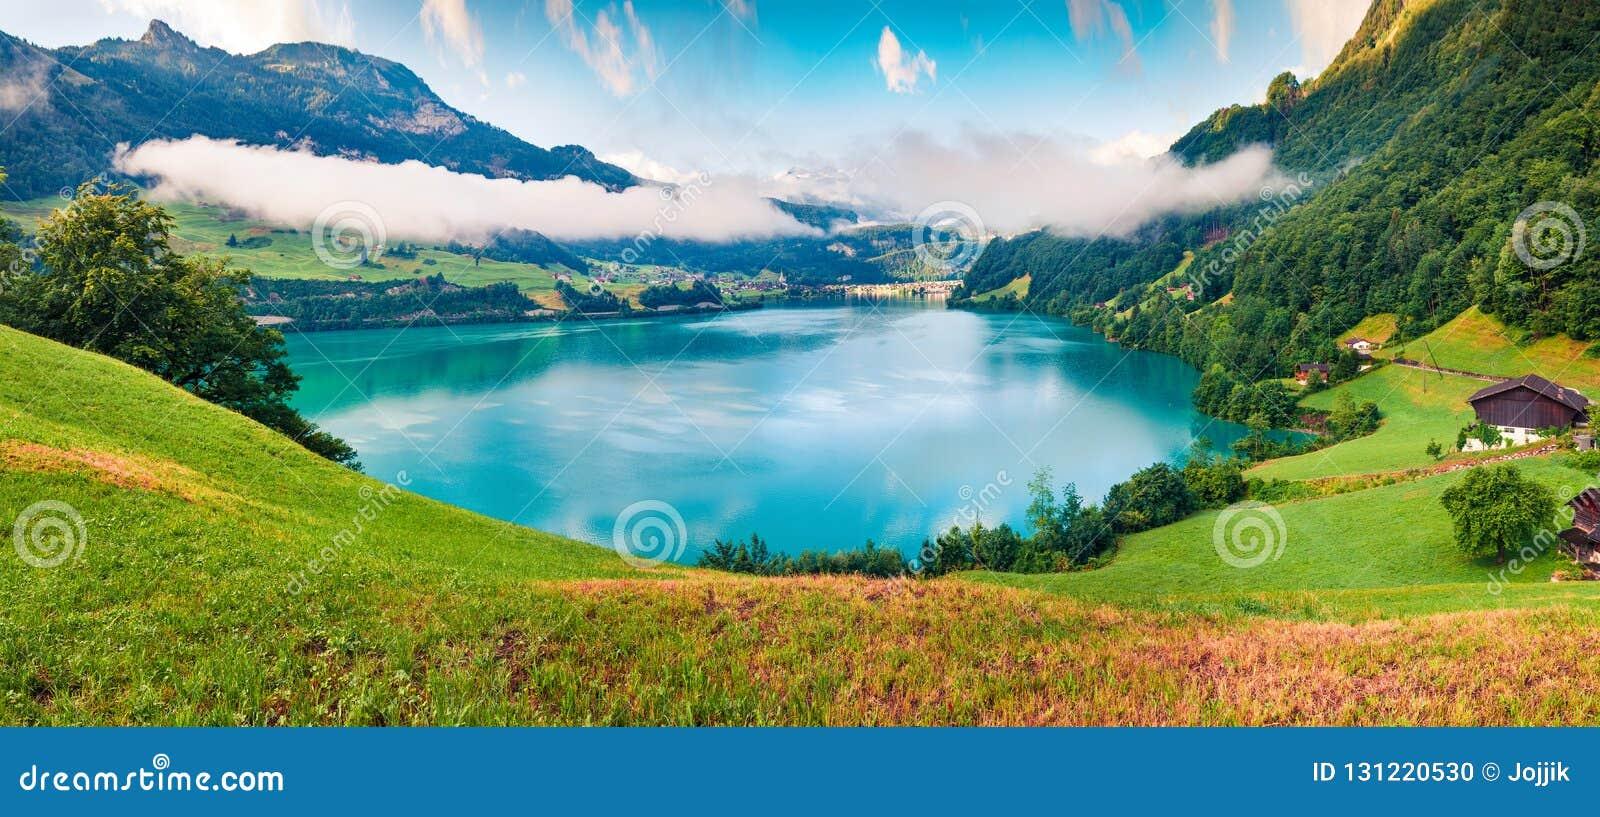 Туманная панорама лета озера Lungerersee Красочный взгляд швейцарских Альп, положение утра деревни Lungern, Швейцария, Европа